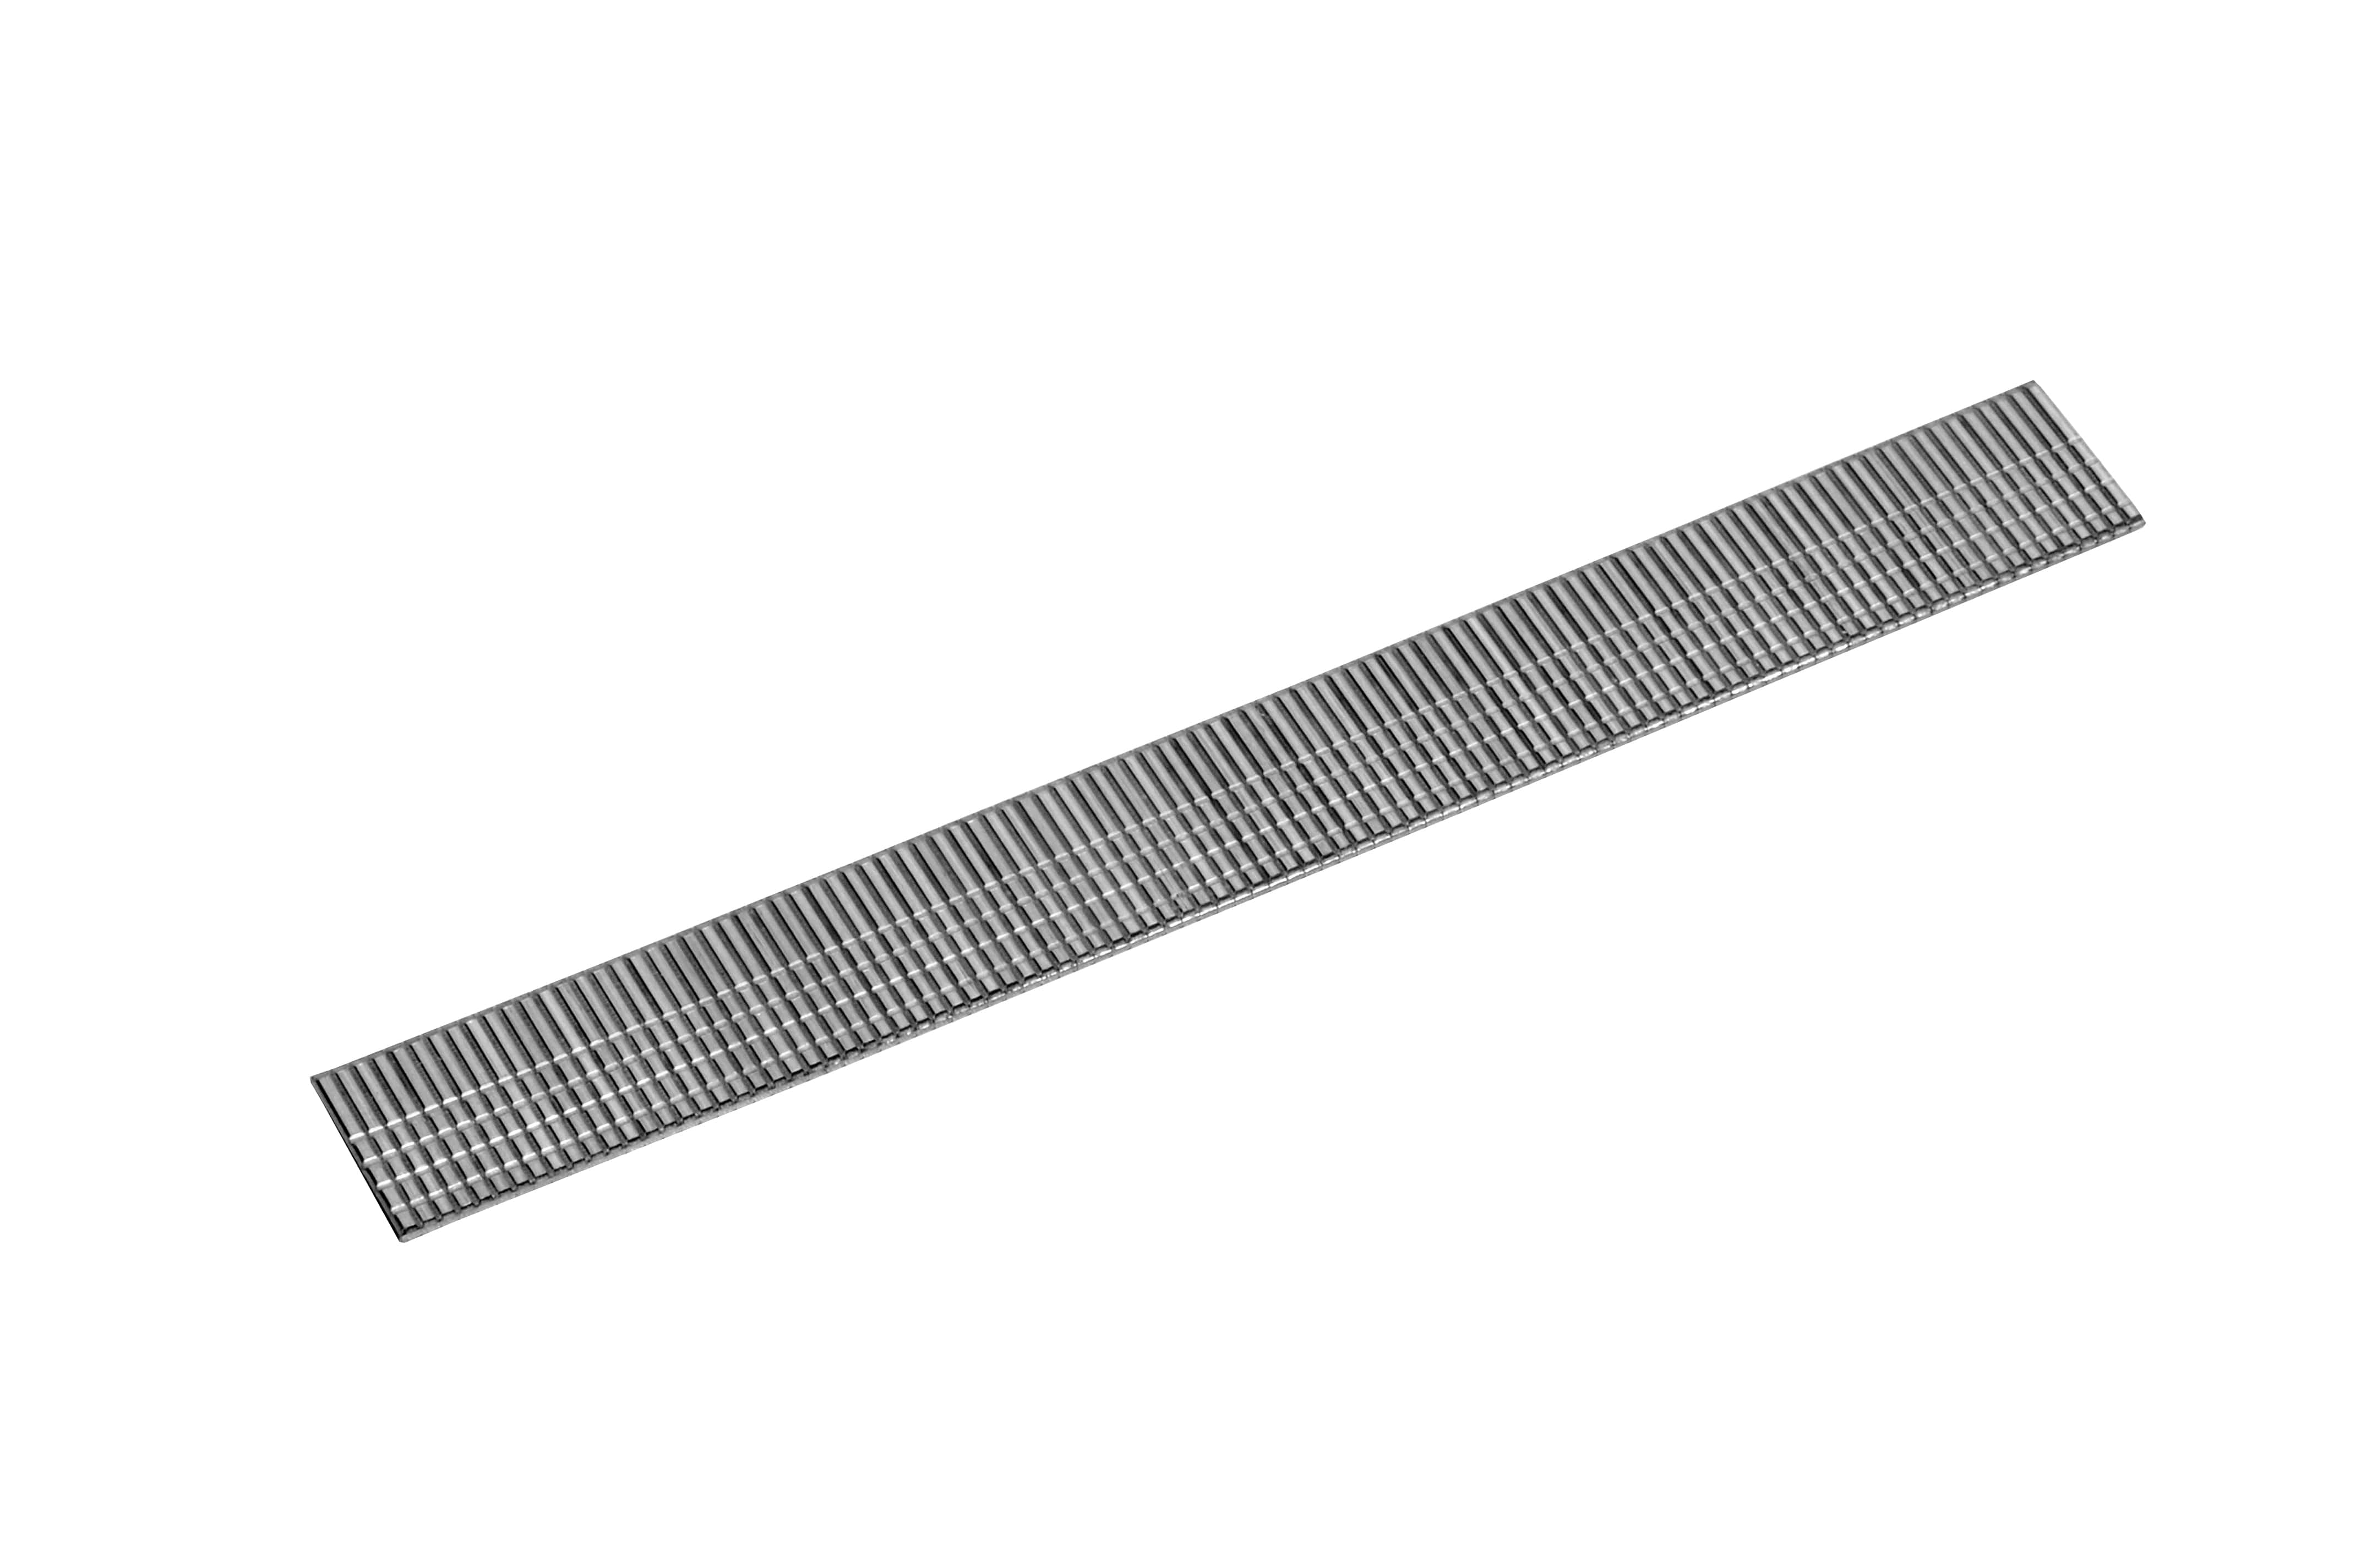 pins-14mm